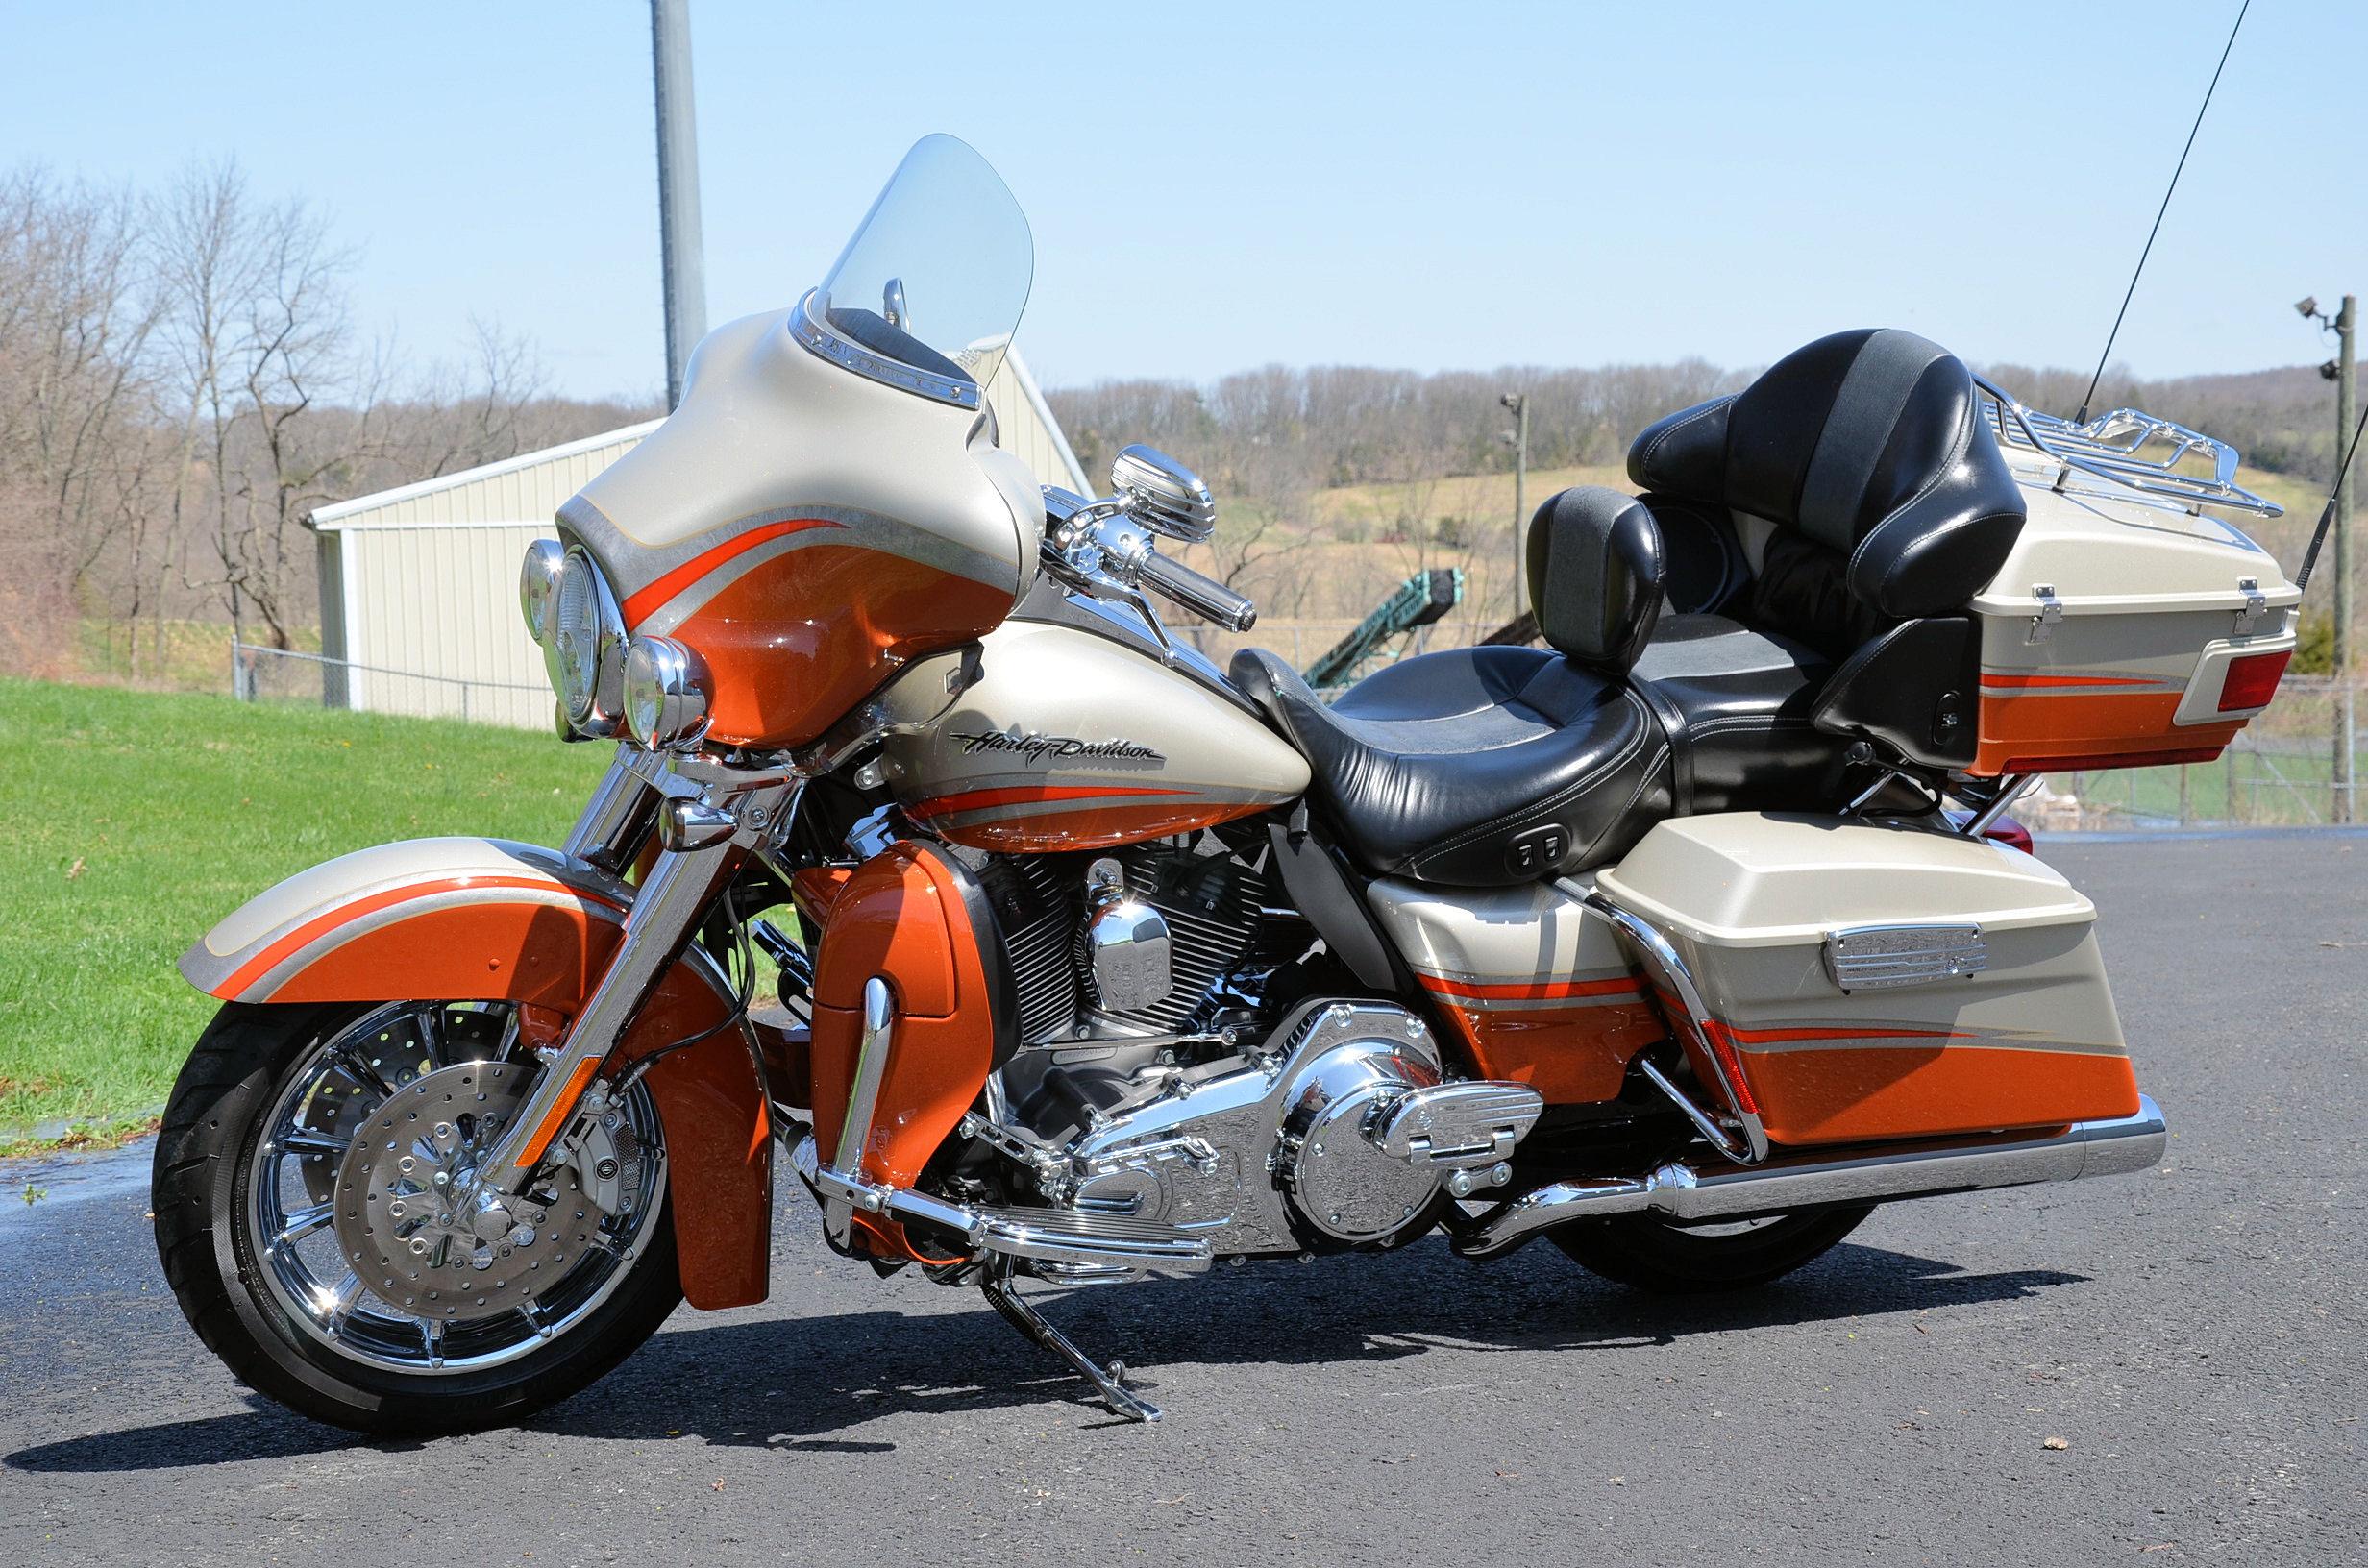 2011 Harley Davidson Electra Glide Ultra Classic Limited Flhtk